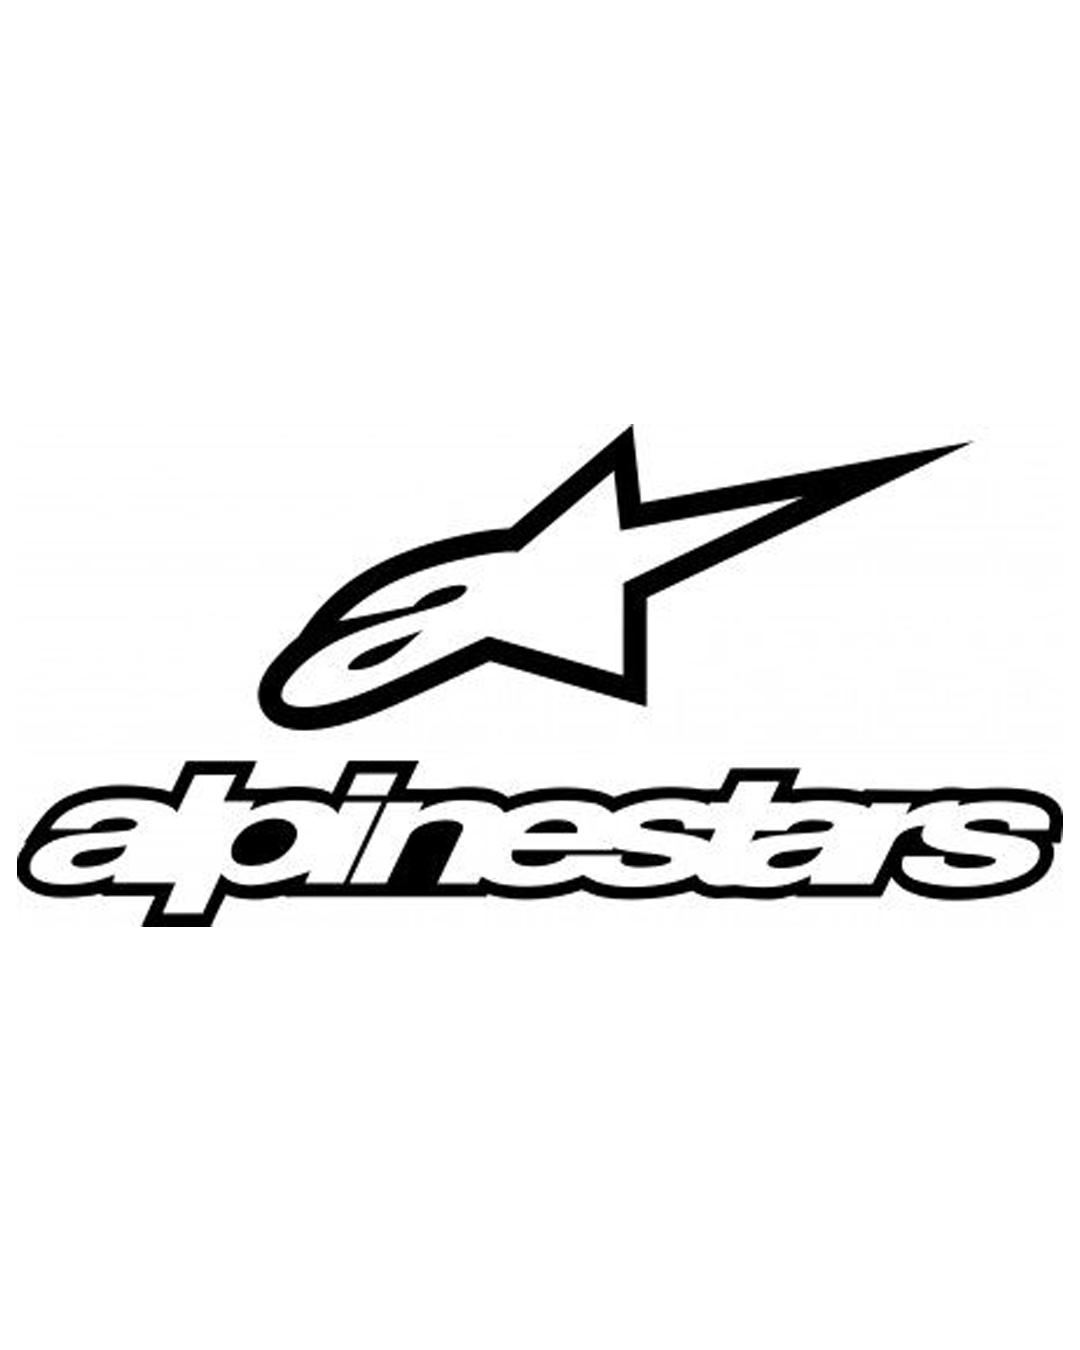 alpinesters_logo.jpg